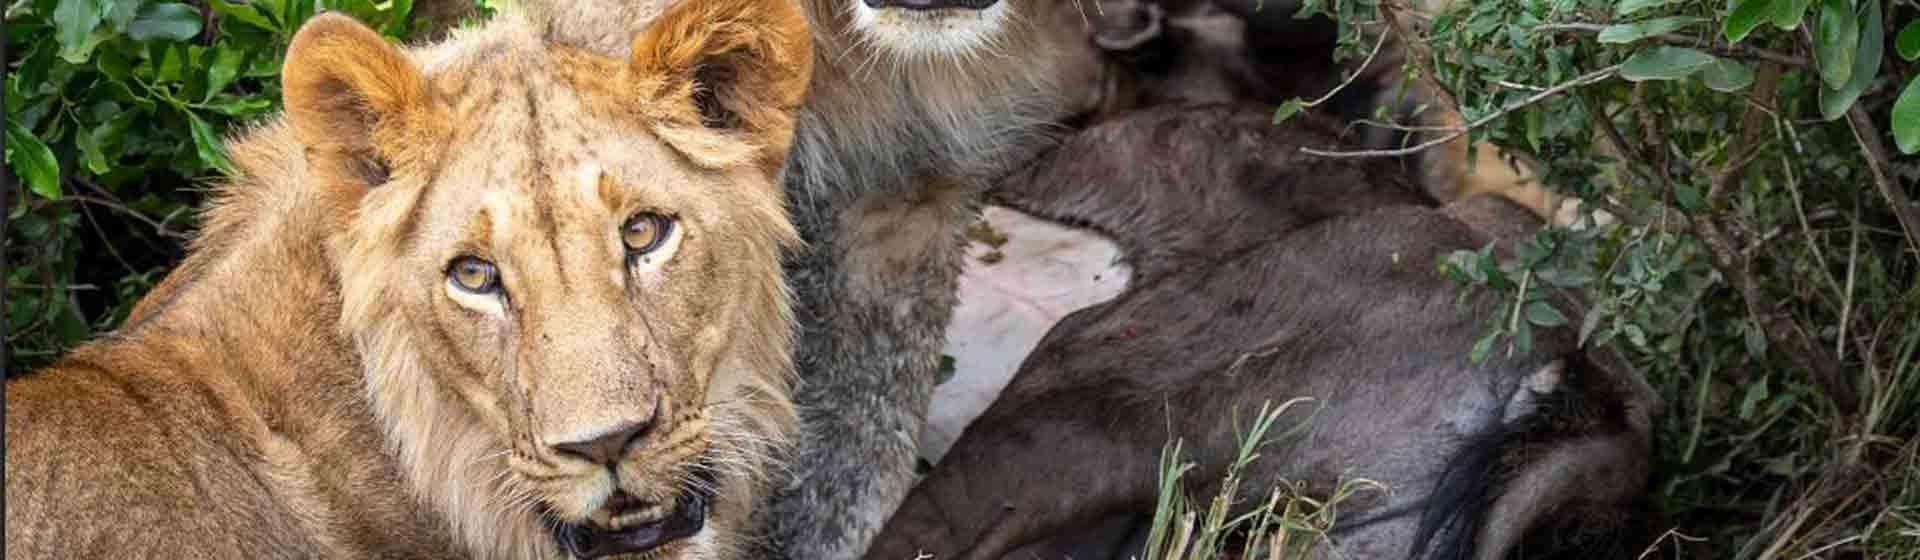 Lion killing a wildebeest in Masai Mara